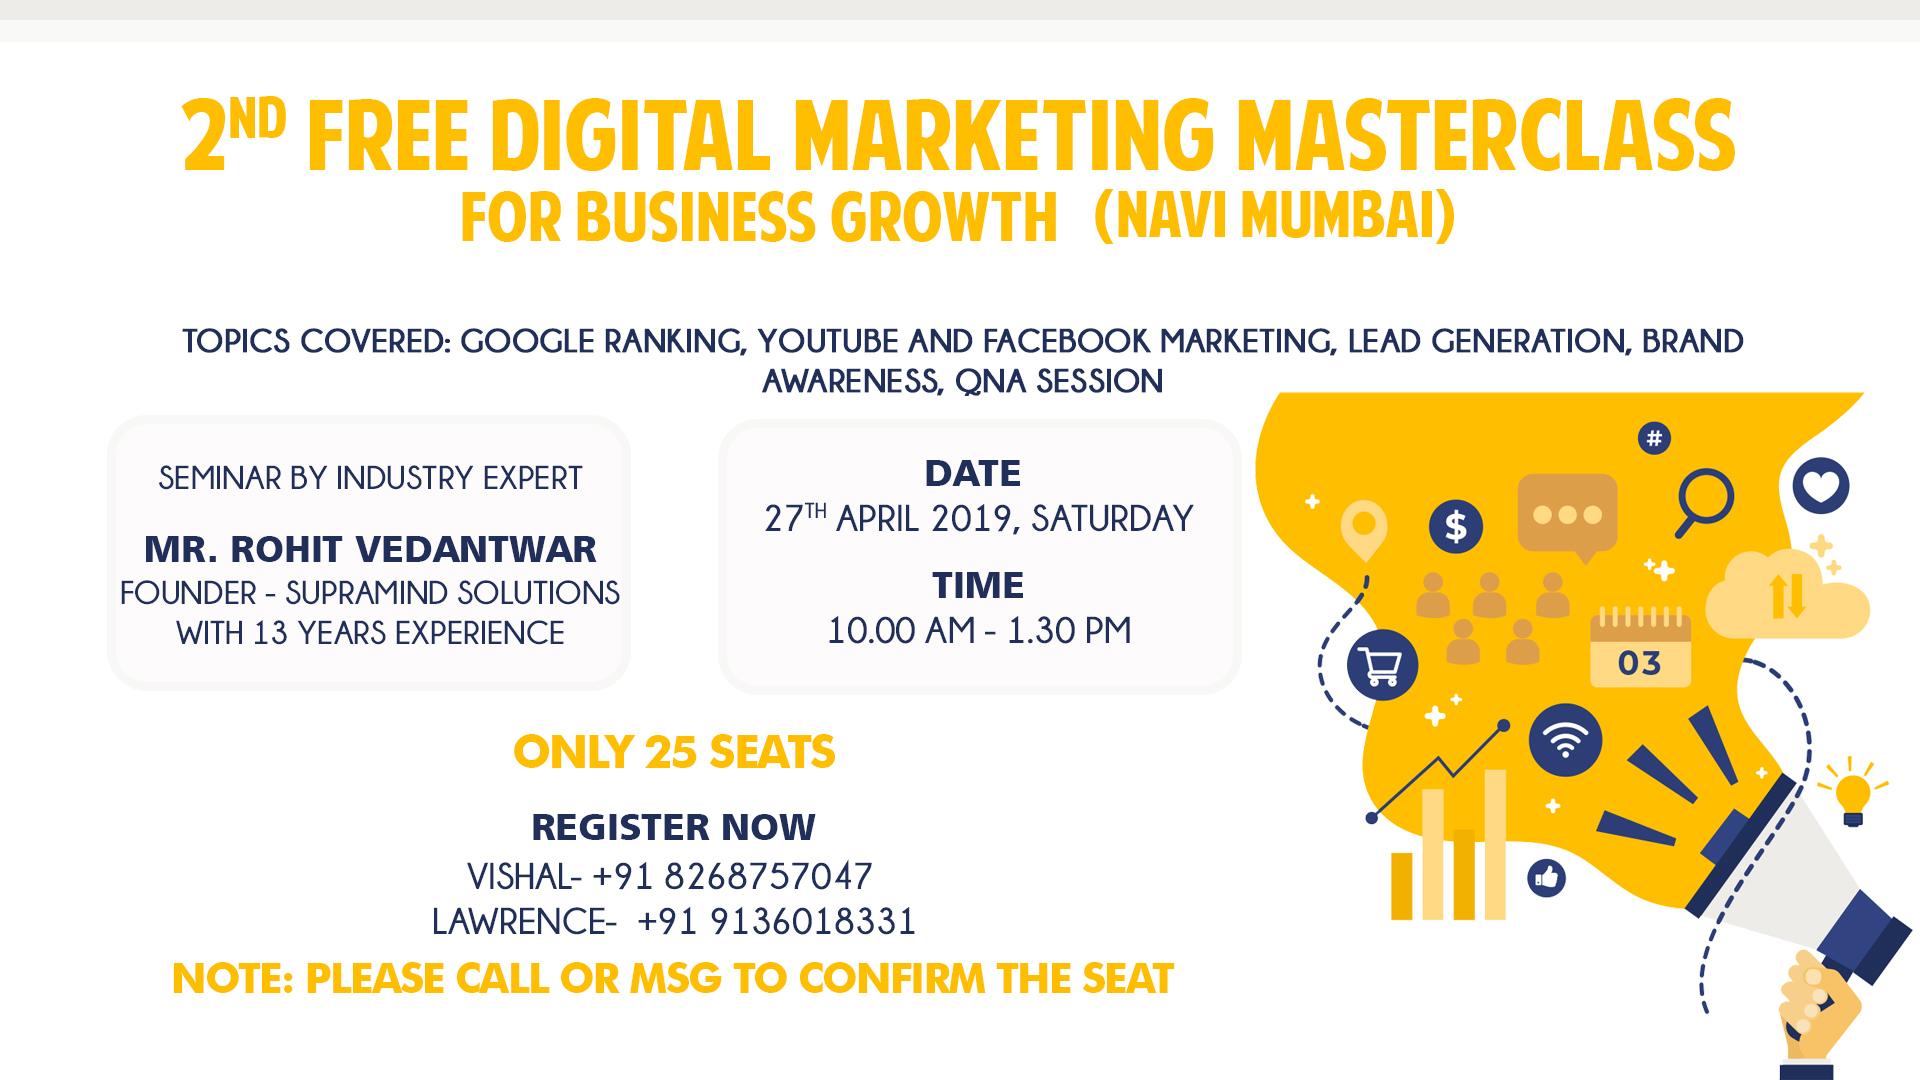 2nd Free Digital Marketing Masterclass for Successful Business Growth, Mumbai suburban, Maharashtra, India